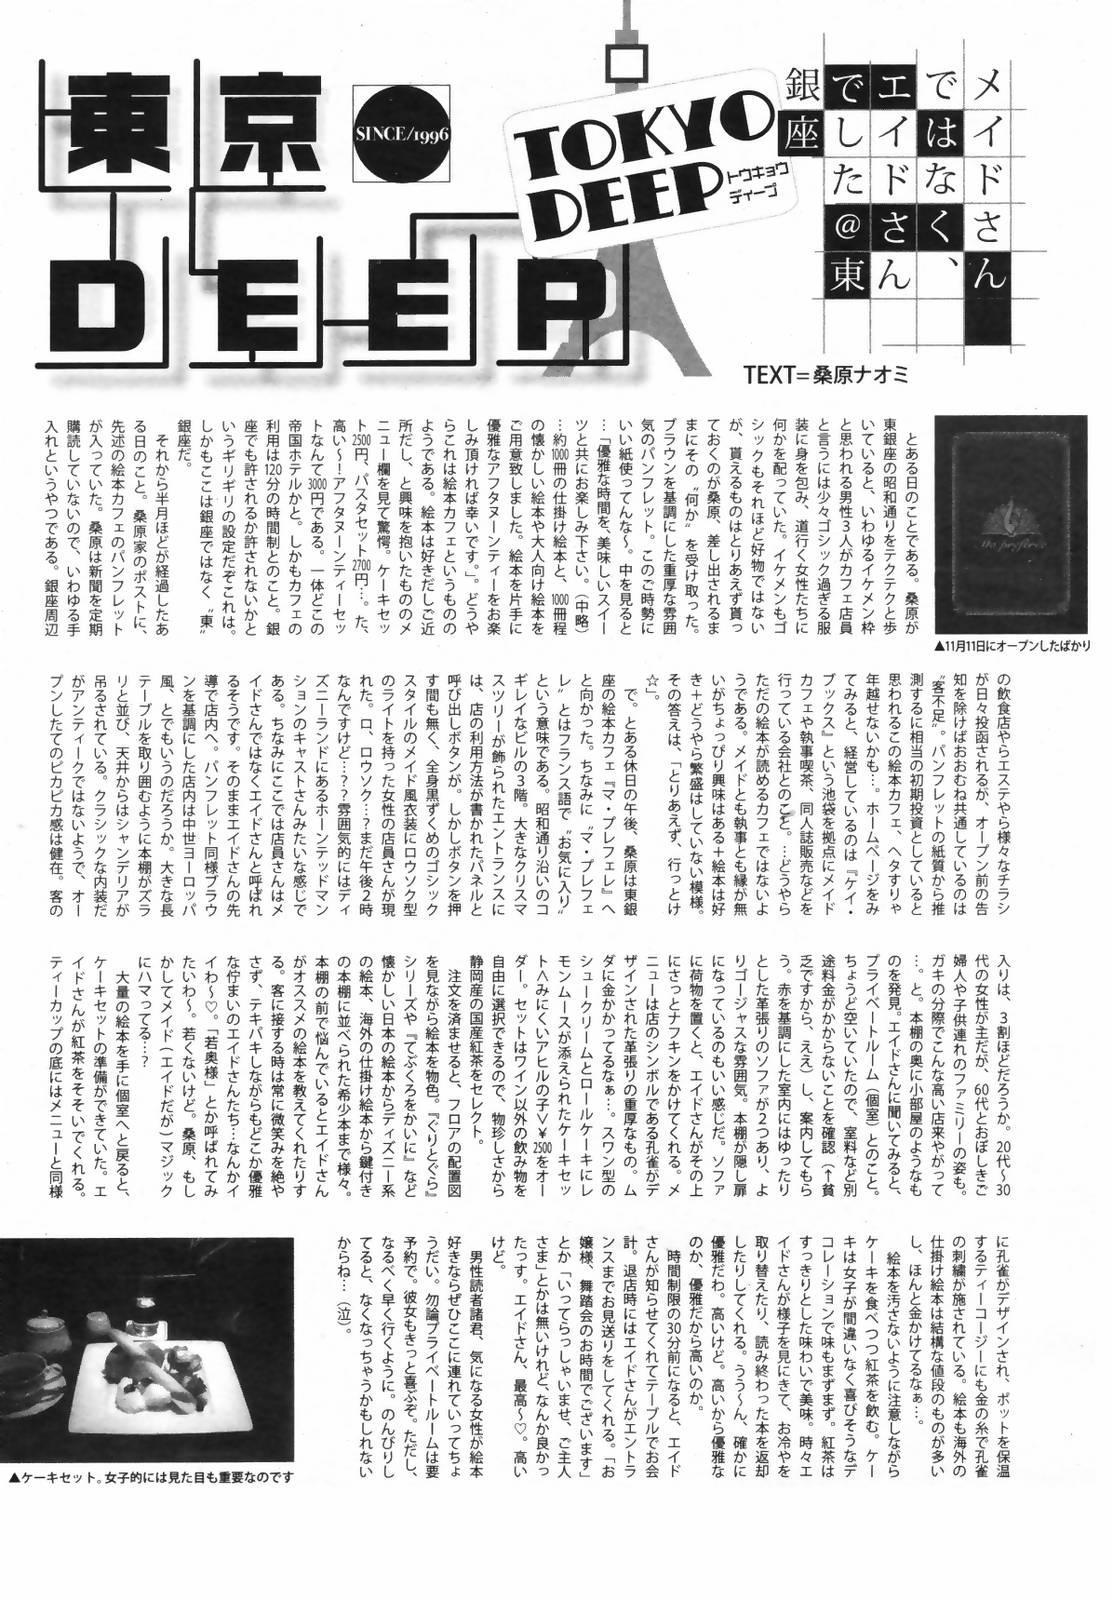 Manga Bangaichi 2009-02 Vol. 234 247